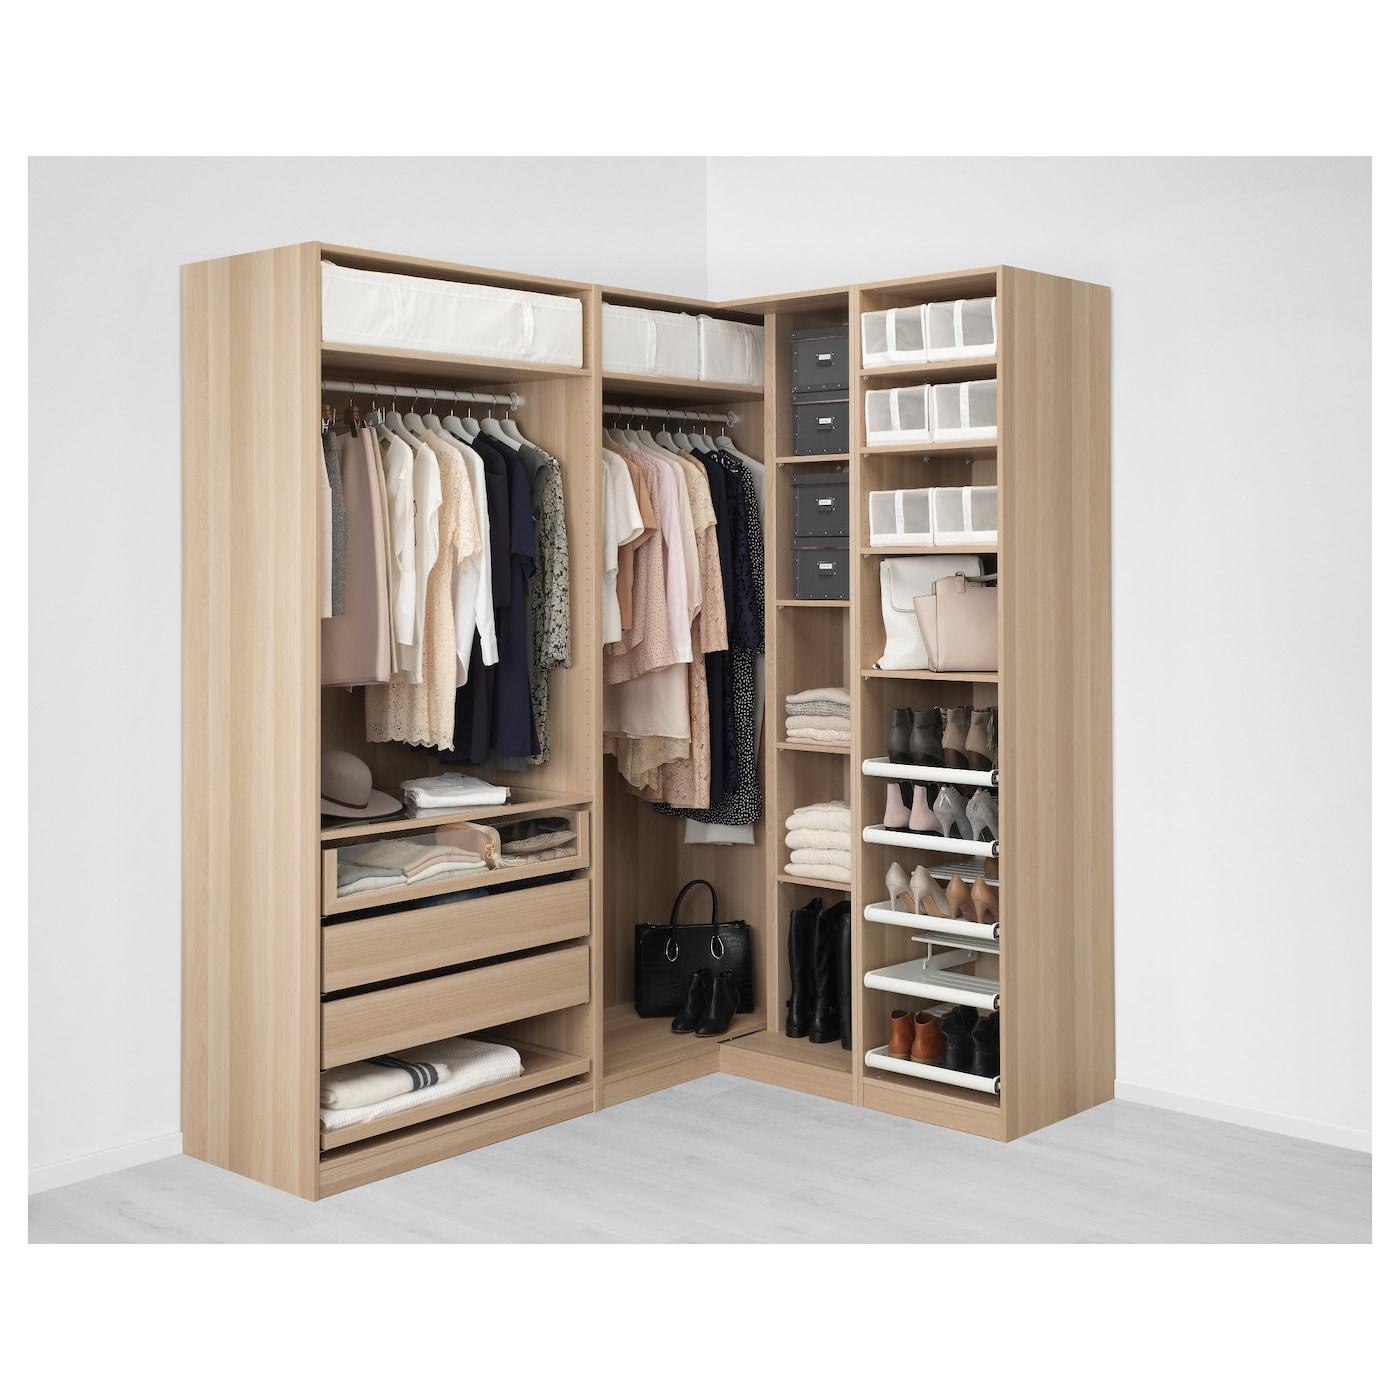 Dressing Ikea Angle Sans Porte pax armoire d'angle - effet chêne blanchi, forsand vikedal 210/160x236 cm